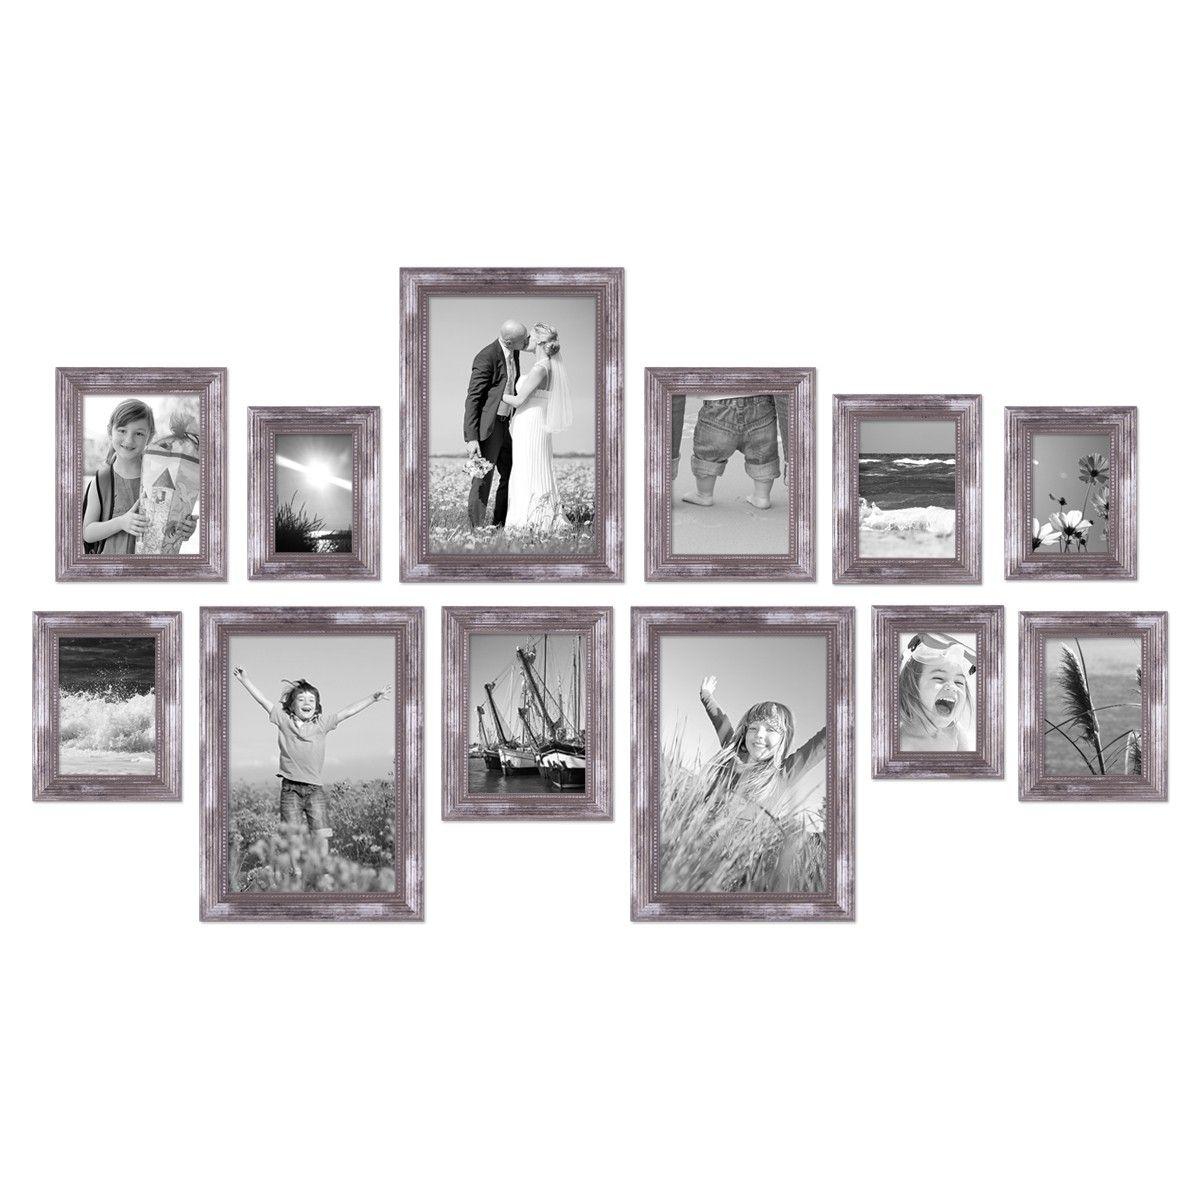 12er-Set Bilderrahmen Silber Barock Antik, 10x15, 13x18, 15x20 und ...